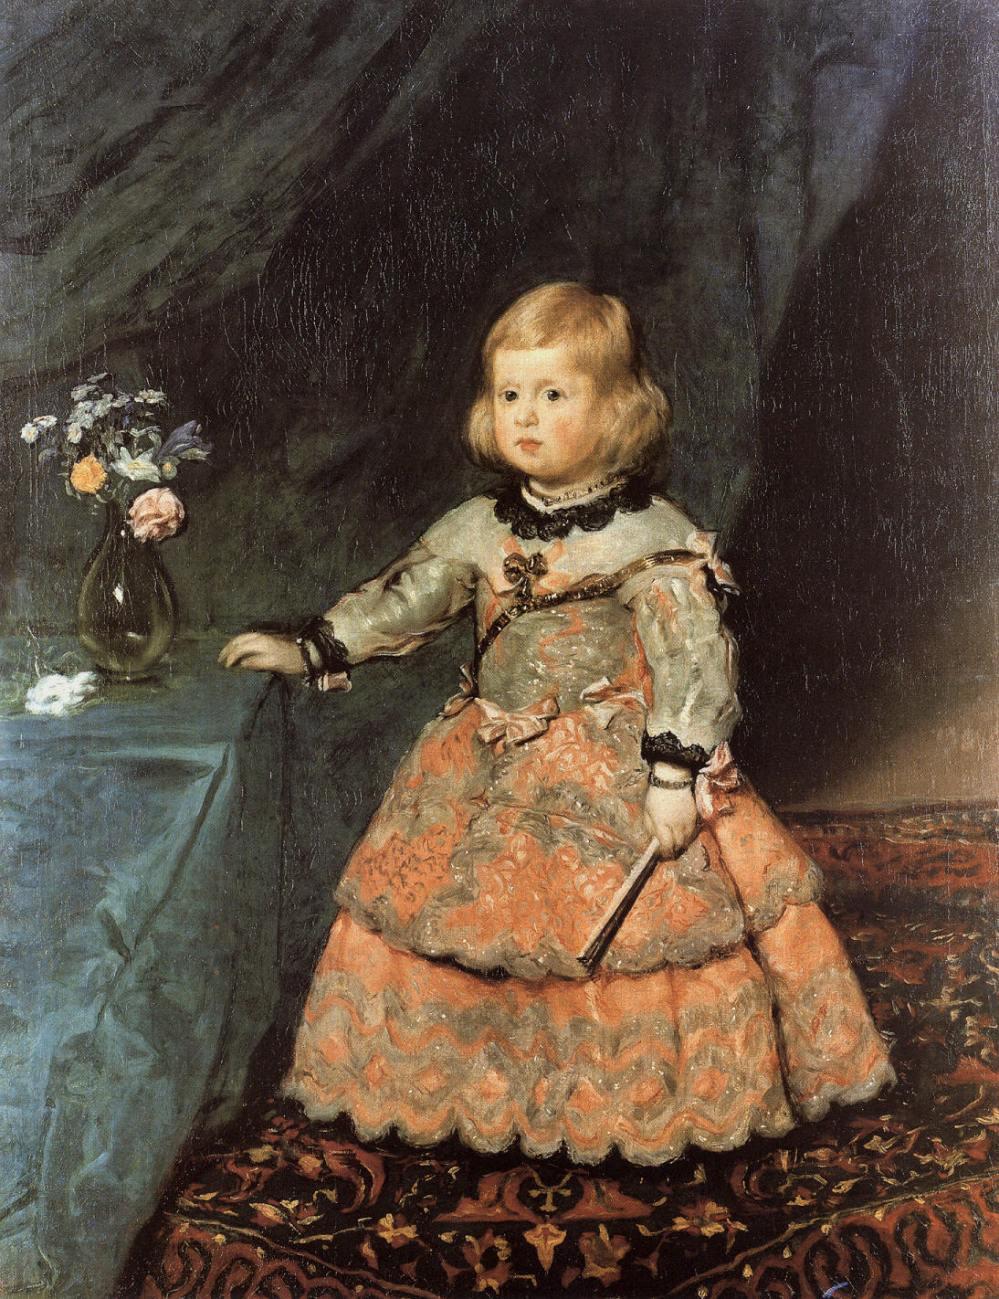 Diego Velázquez. Infanta Margarita vestida de rosa. 1653-54. Kunsthistorisches Museum. Viena.